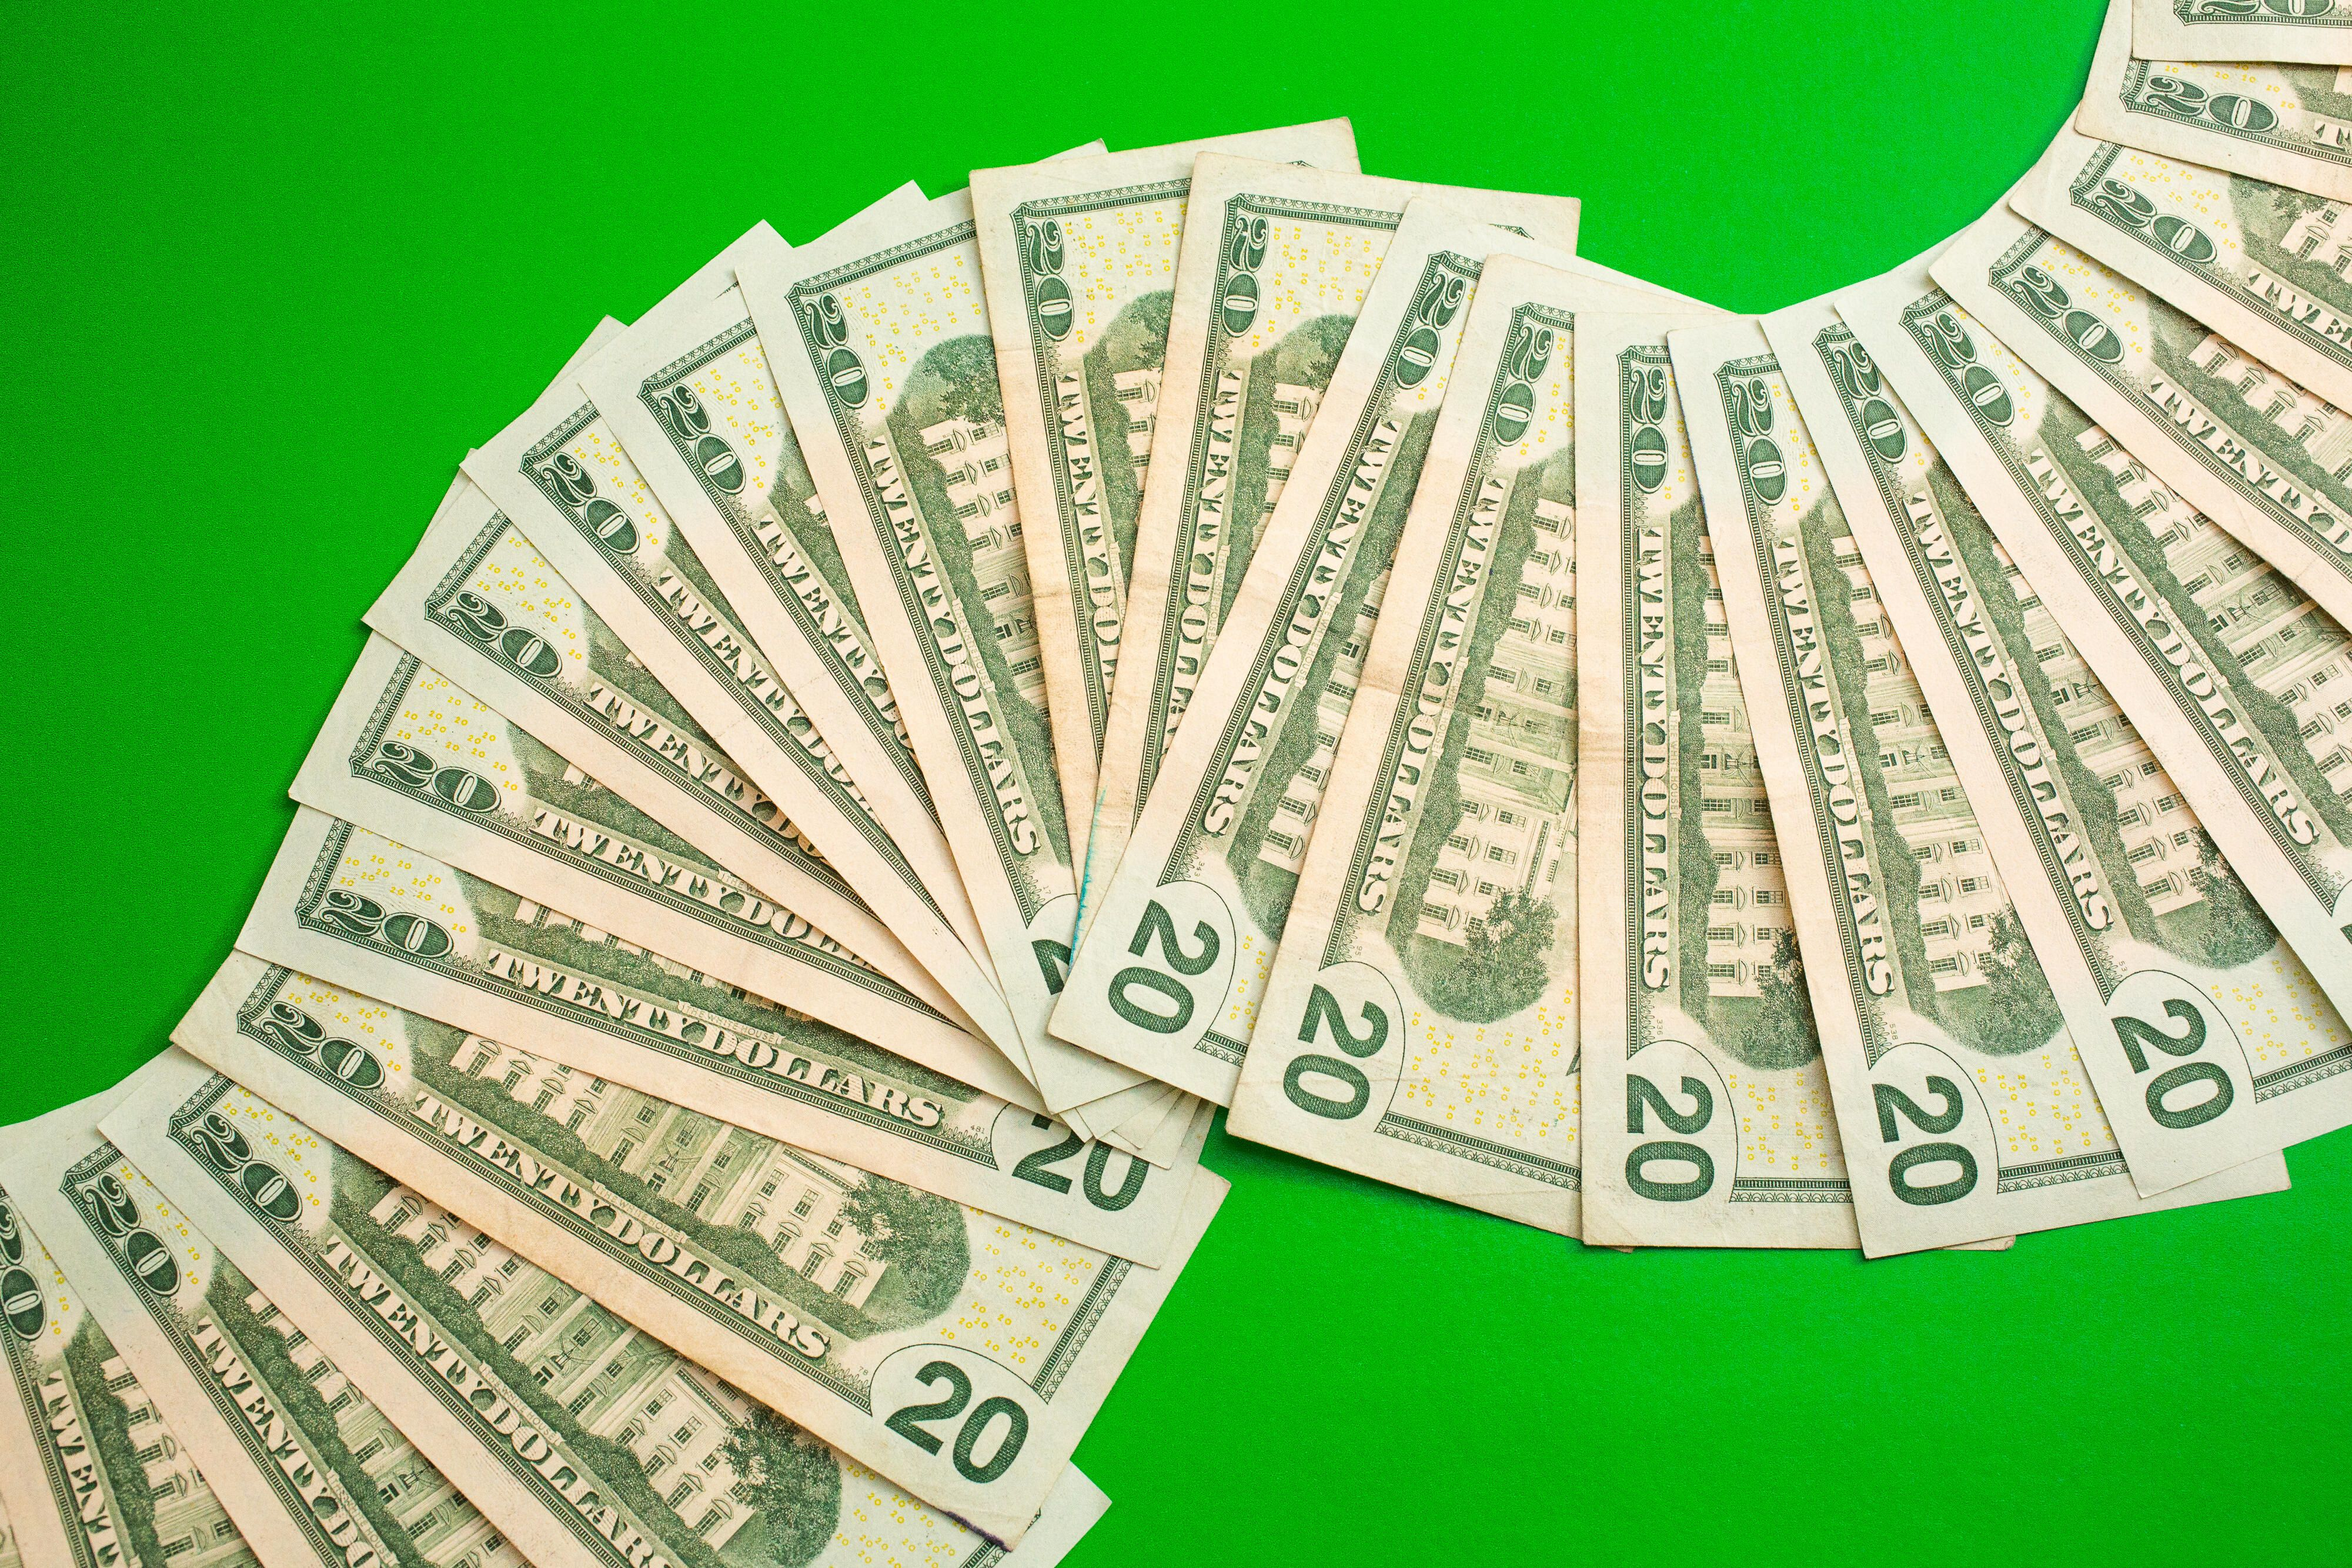 031-cash-money-dollars-bills-stimulus-check-congress-pass-mail-banking-finance-desperate-poverty-us-treasury